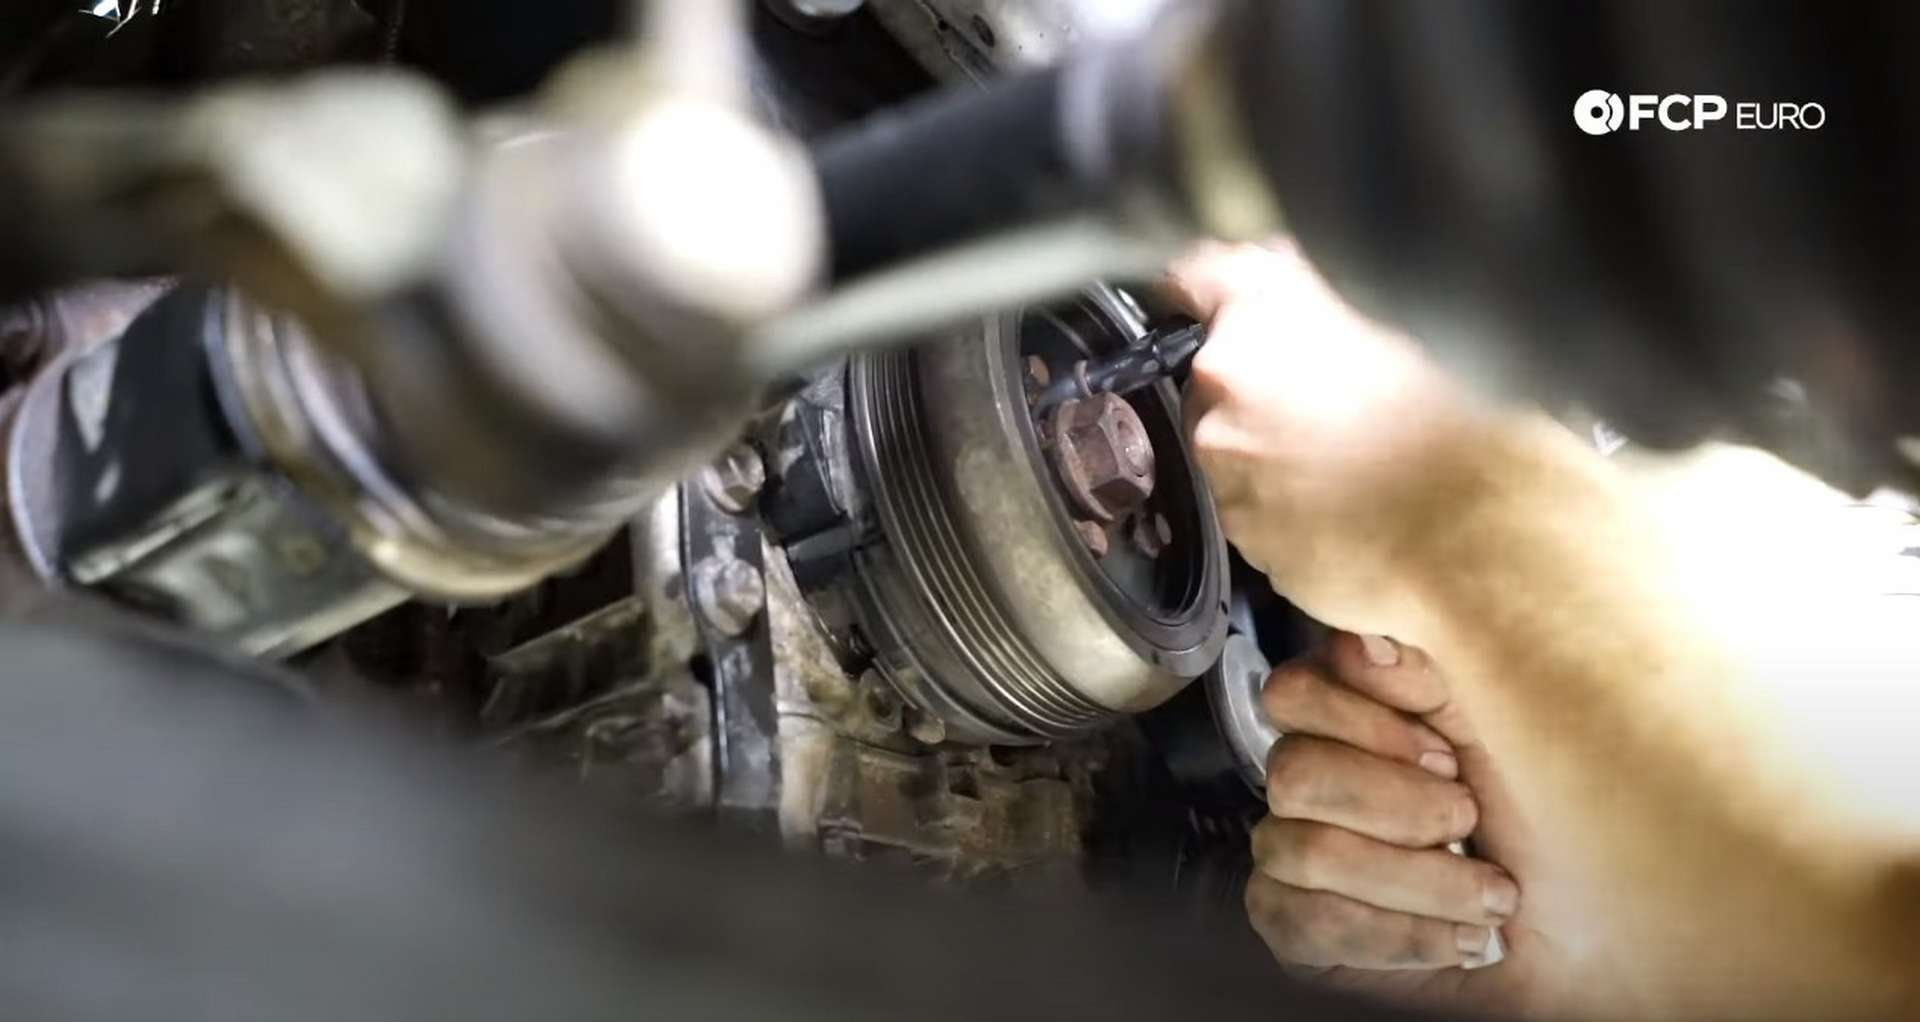 DIY Volvo P1 Water Pump Replacement refitting the crankshaft pulley